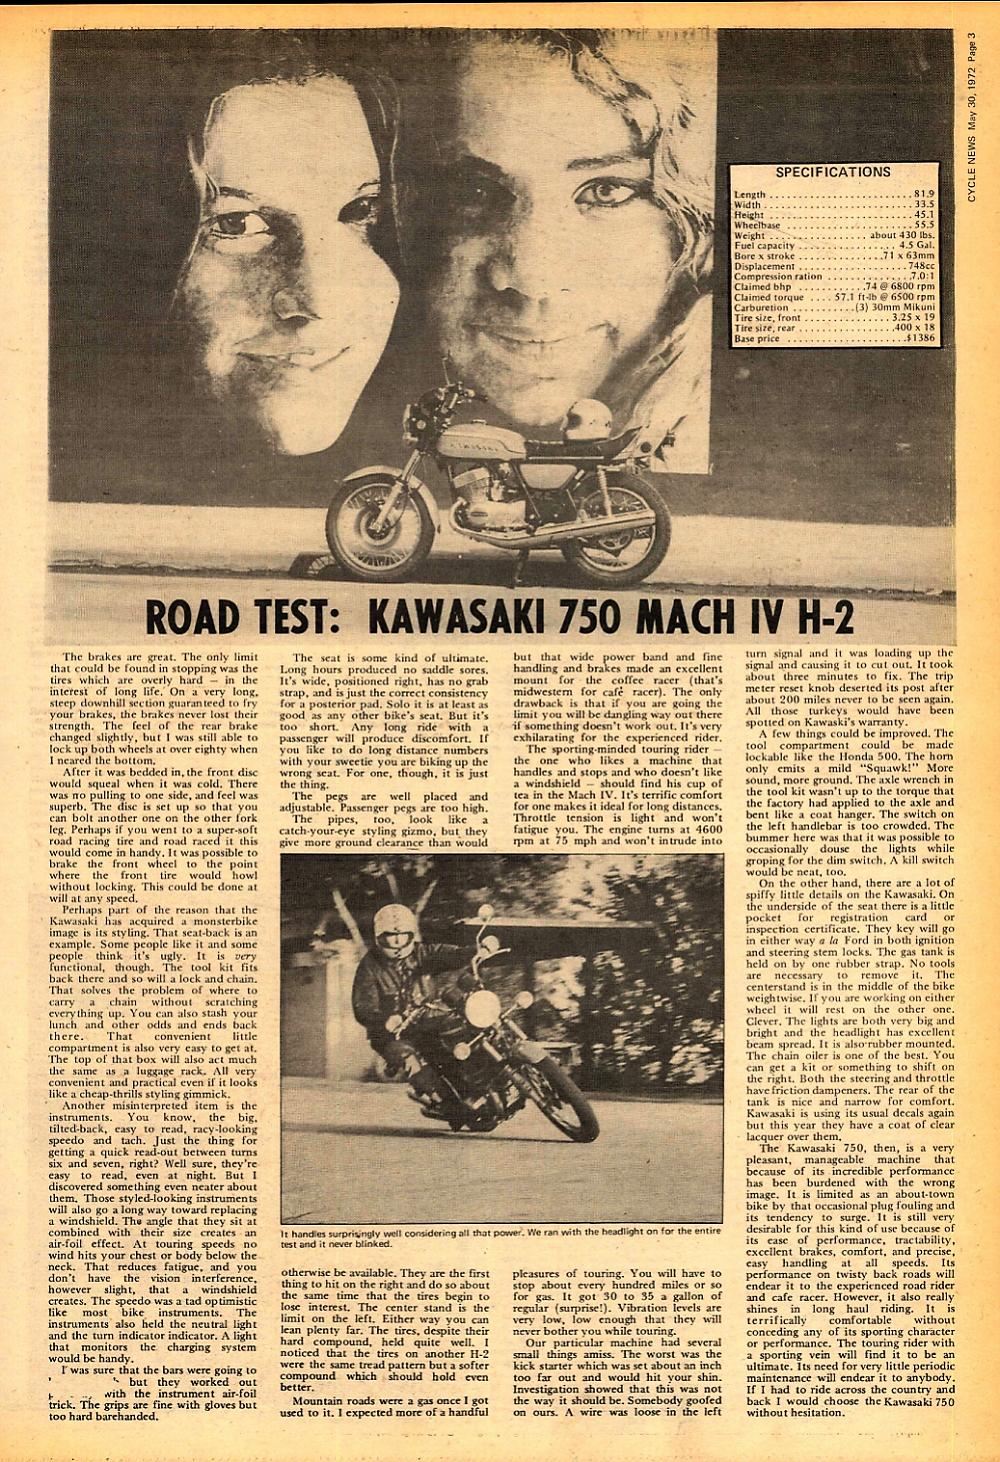 1972 Kawasaki 750 Mach IV road test.3.jpg